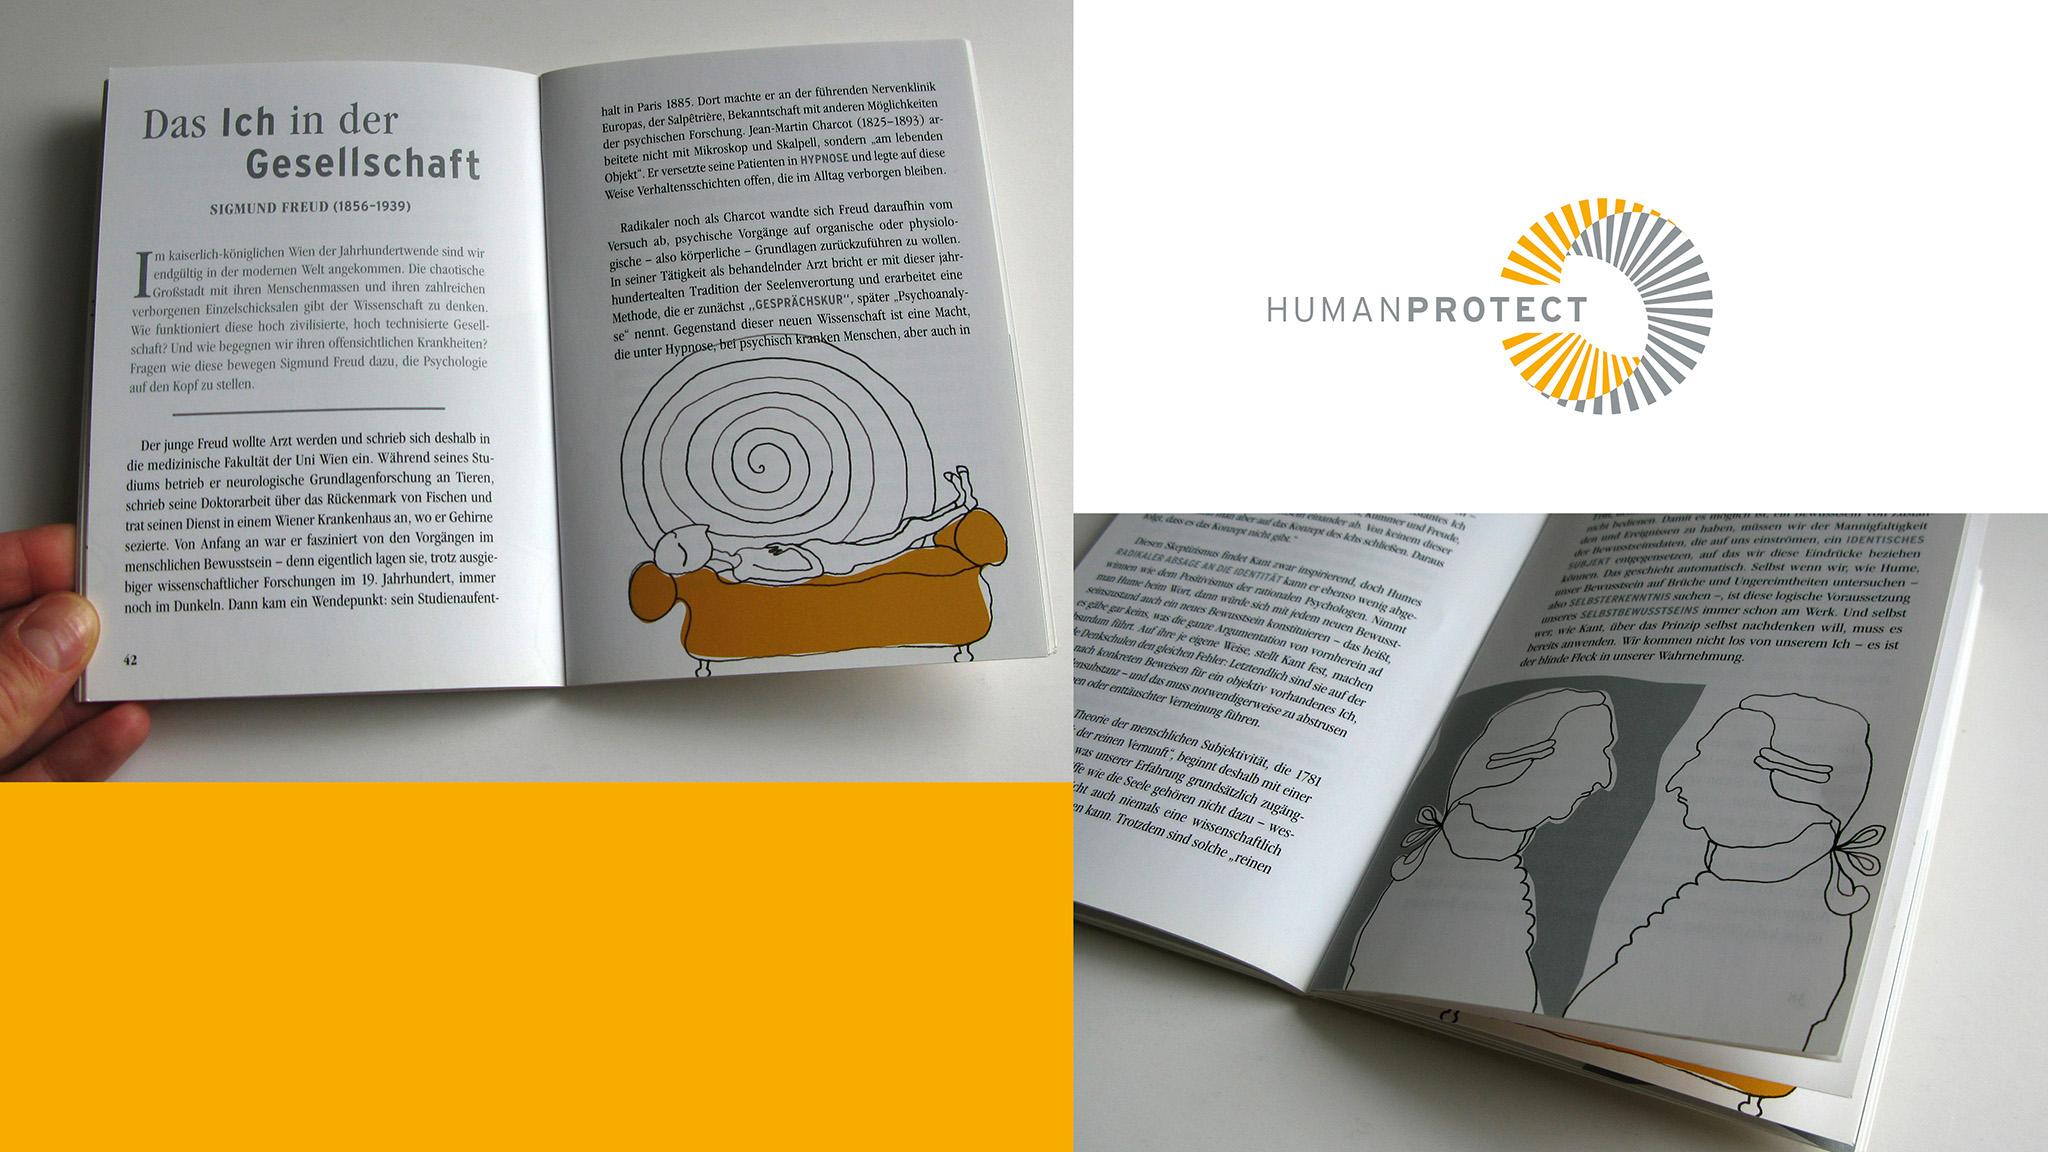 HPC_Buch der Seele_2048x1152px_04